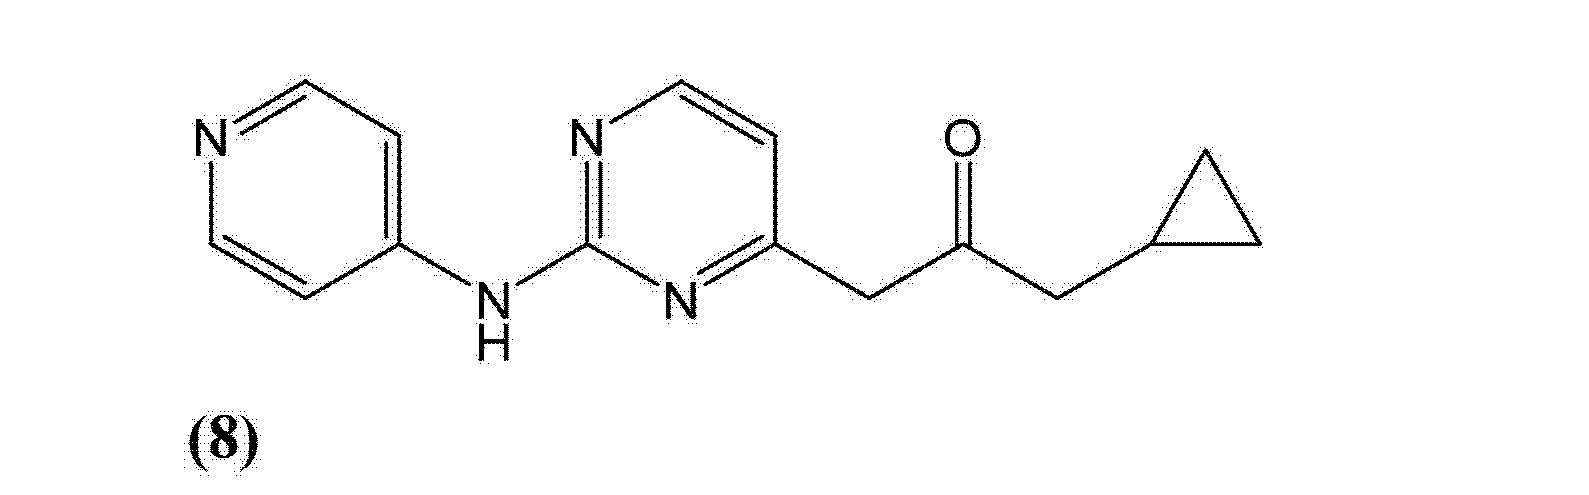 Figure CN103270026AD00513